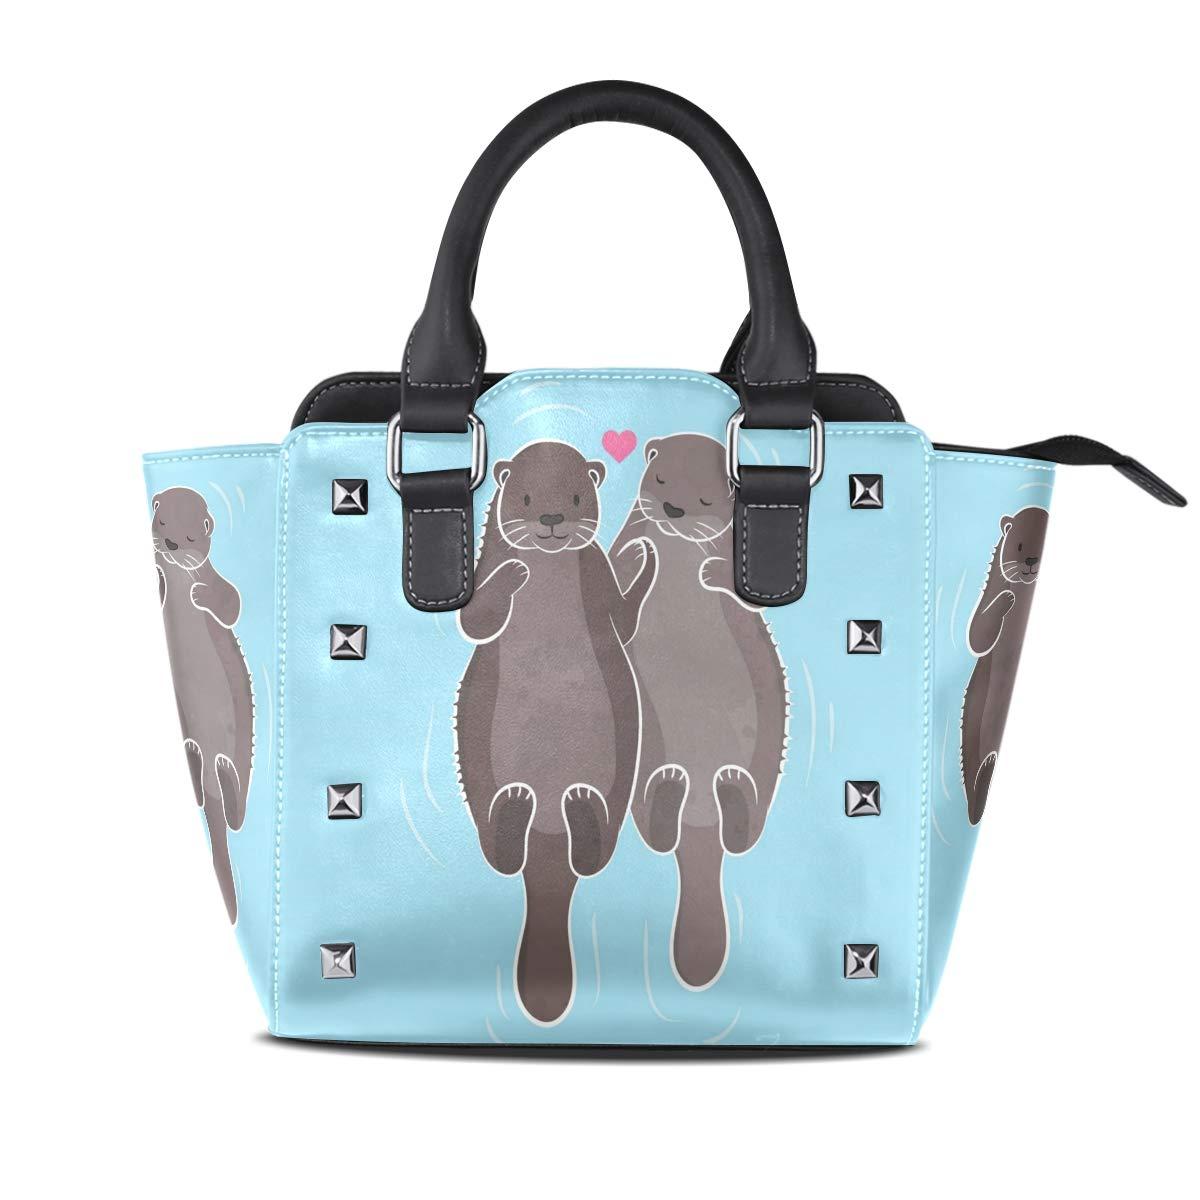 Design5 Handbag Mole Animal Cartoon Cute Genuine Leather Tote Rivet Bag Shoulder Strap Top Handle Women